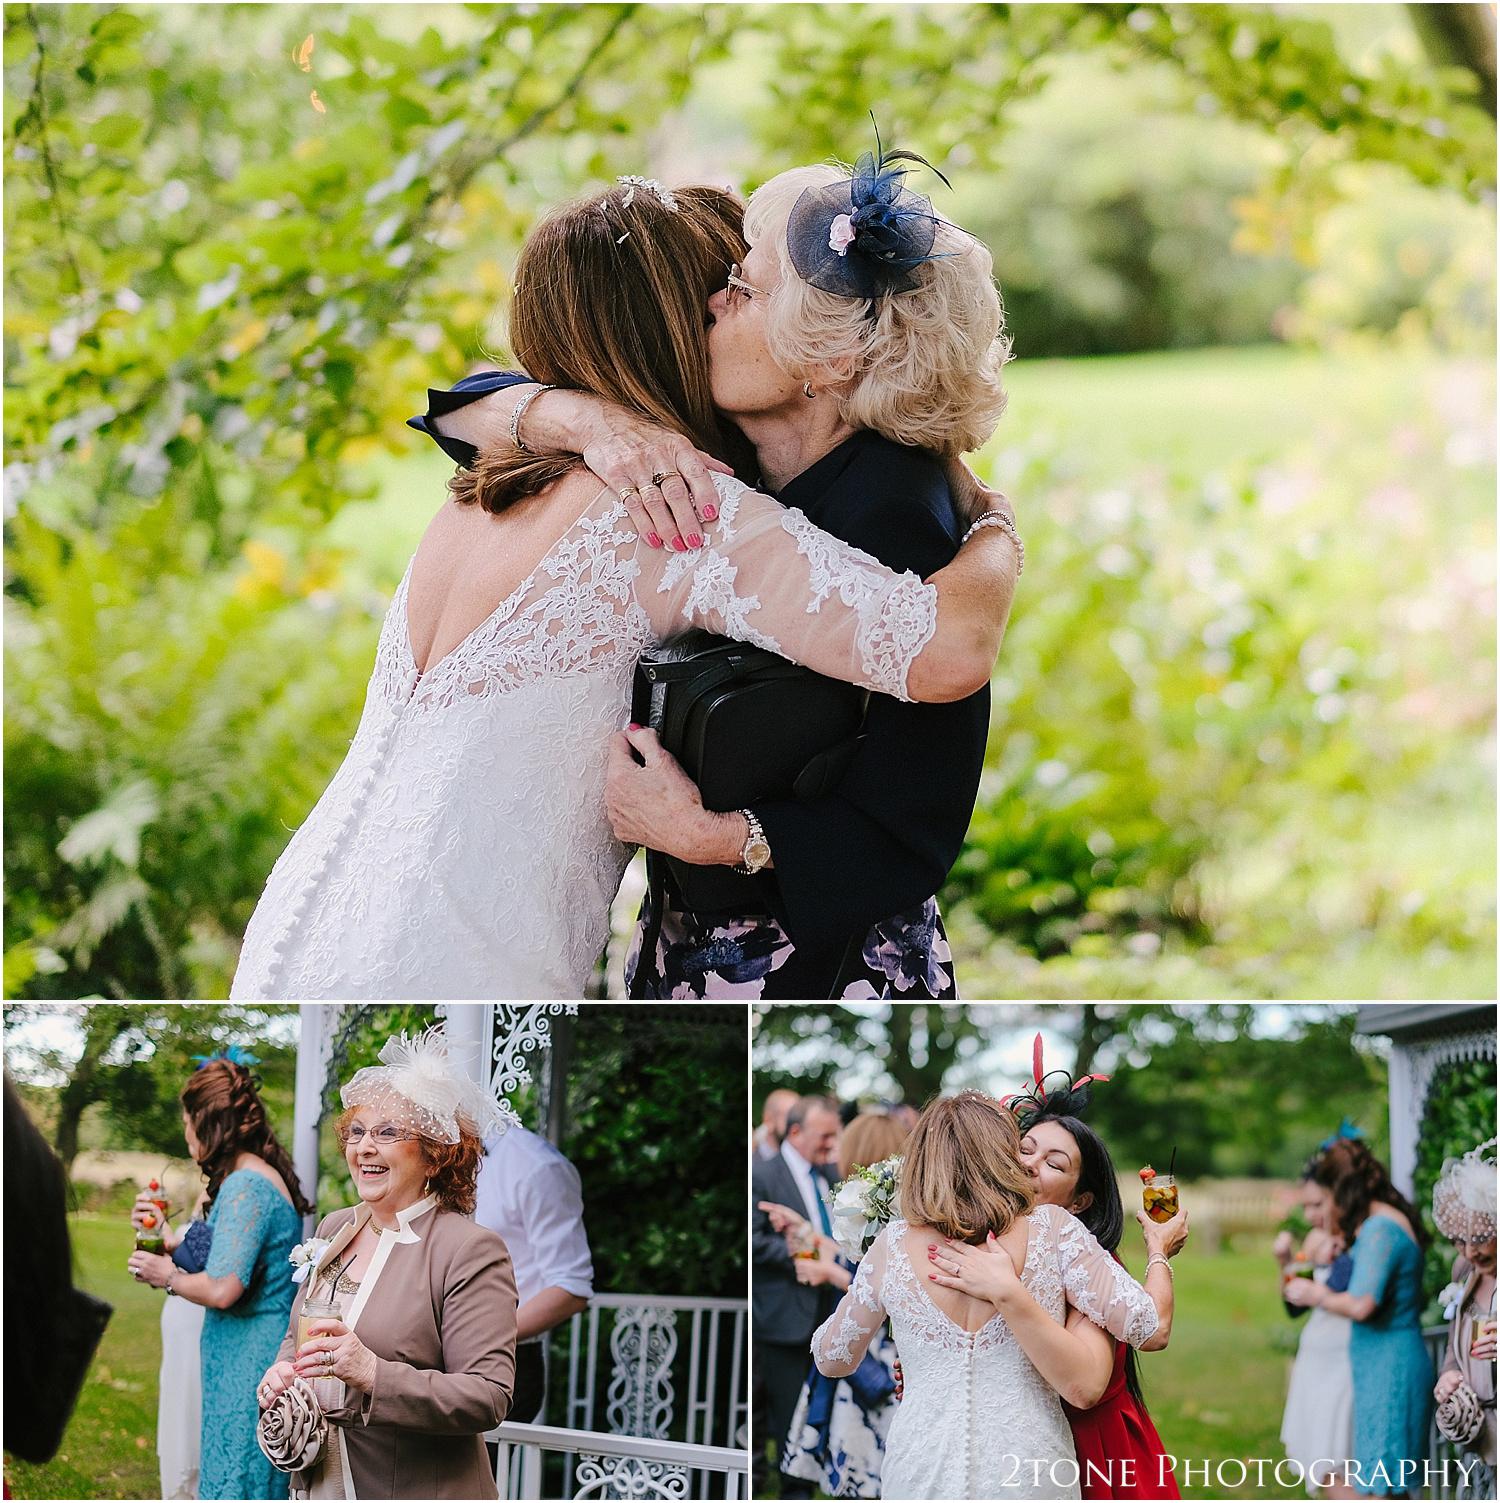 Crook Hall wedding photographer 026.jpg